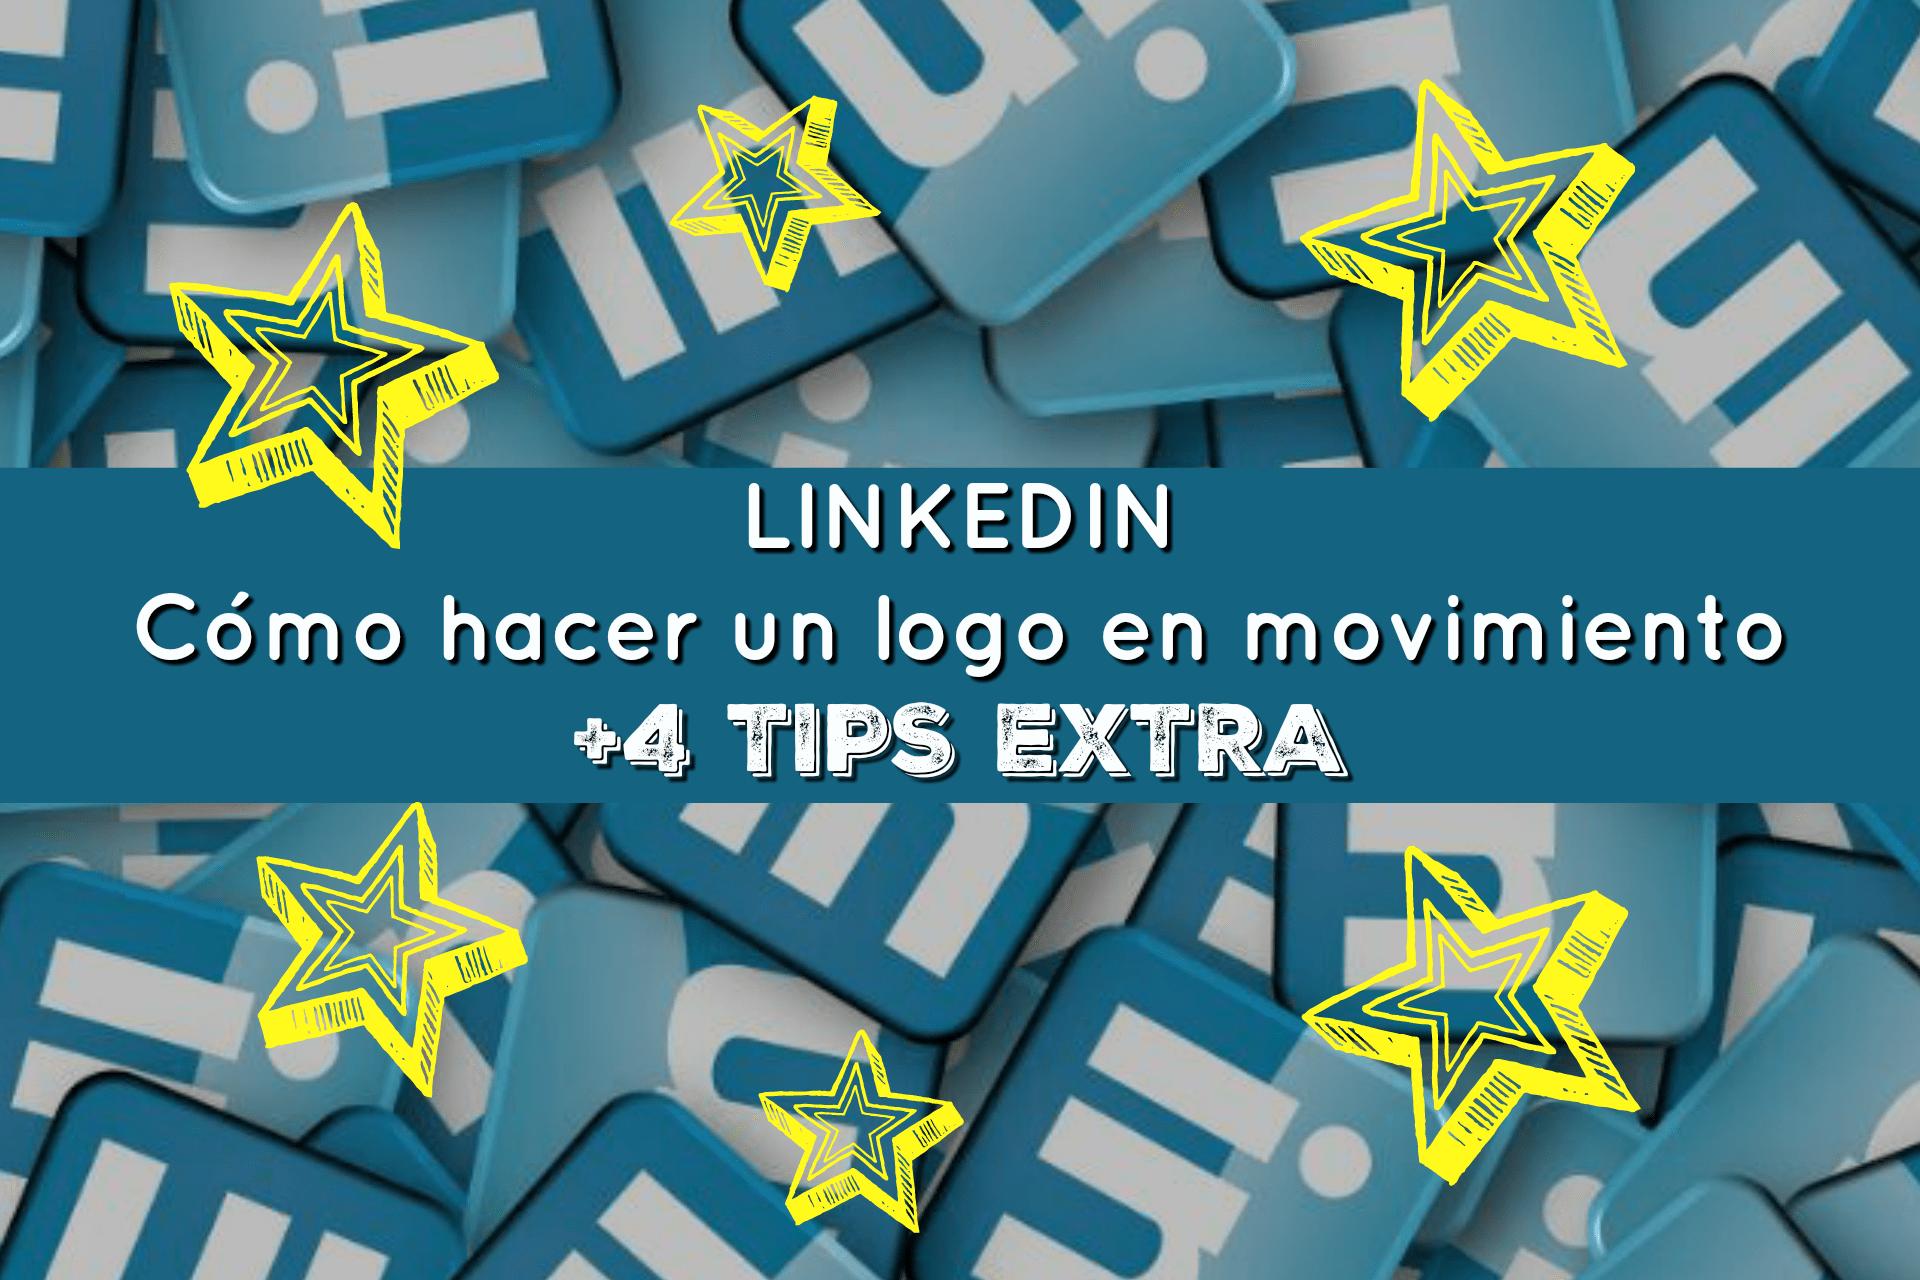 Como hacer un logo en movimiento para LINKEDIN + 4 TIPS EXTRA